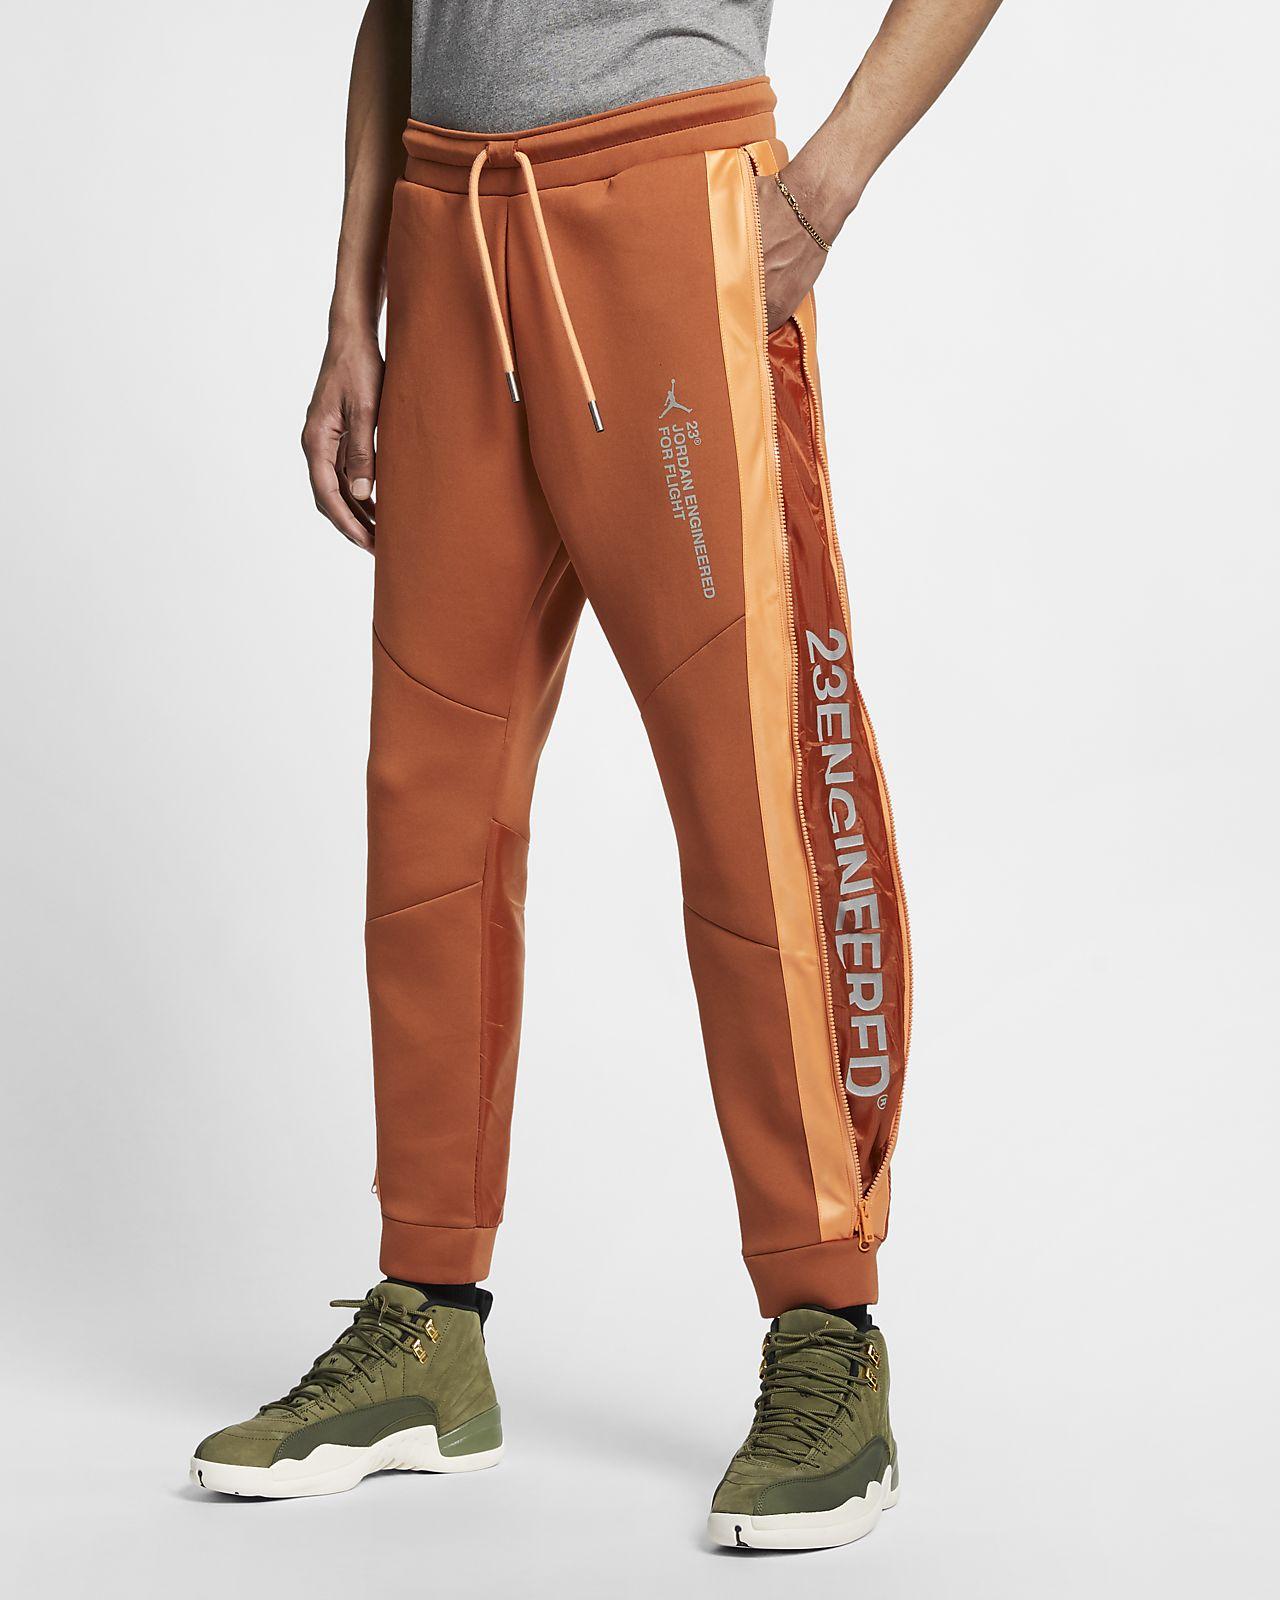 Jordan 23 Engineered Pantalons - Home